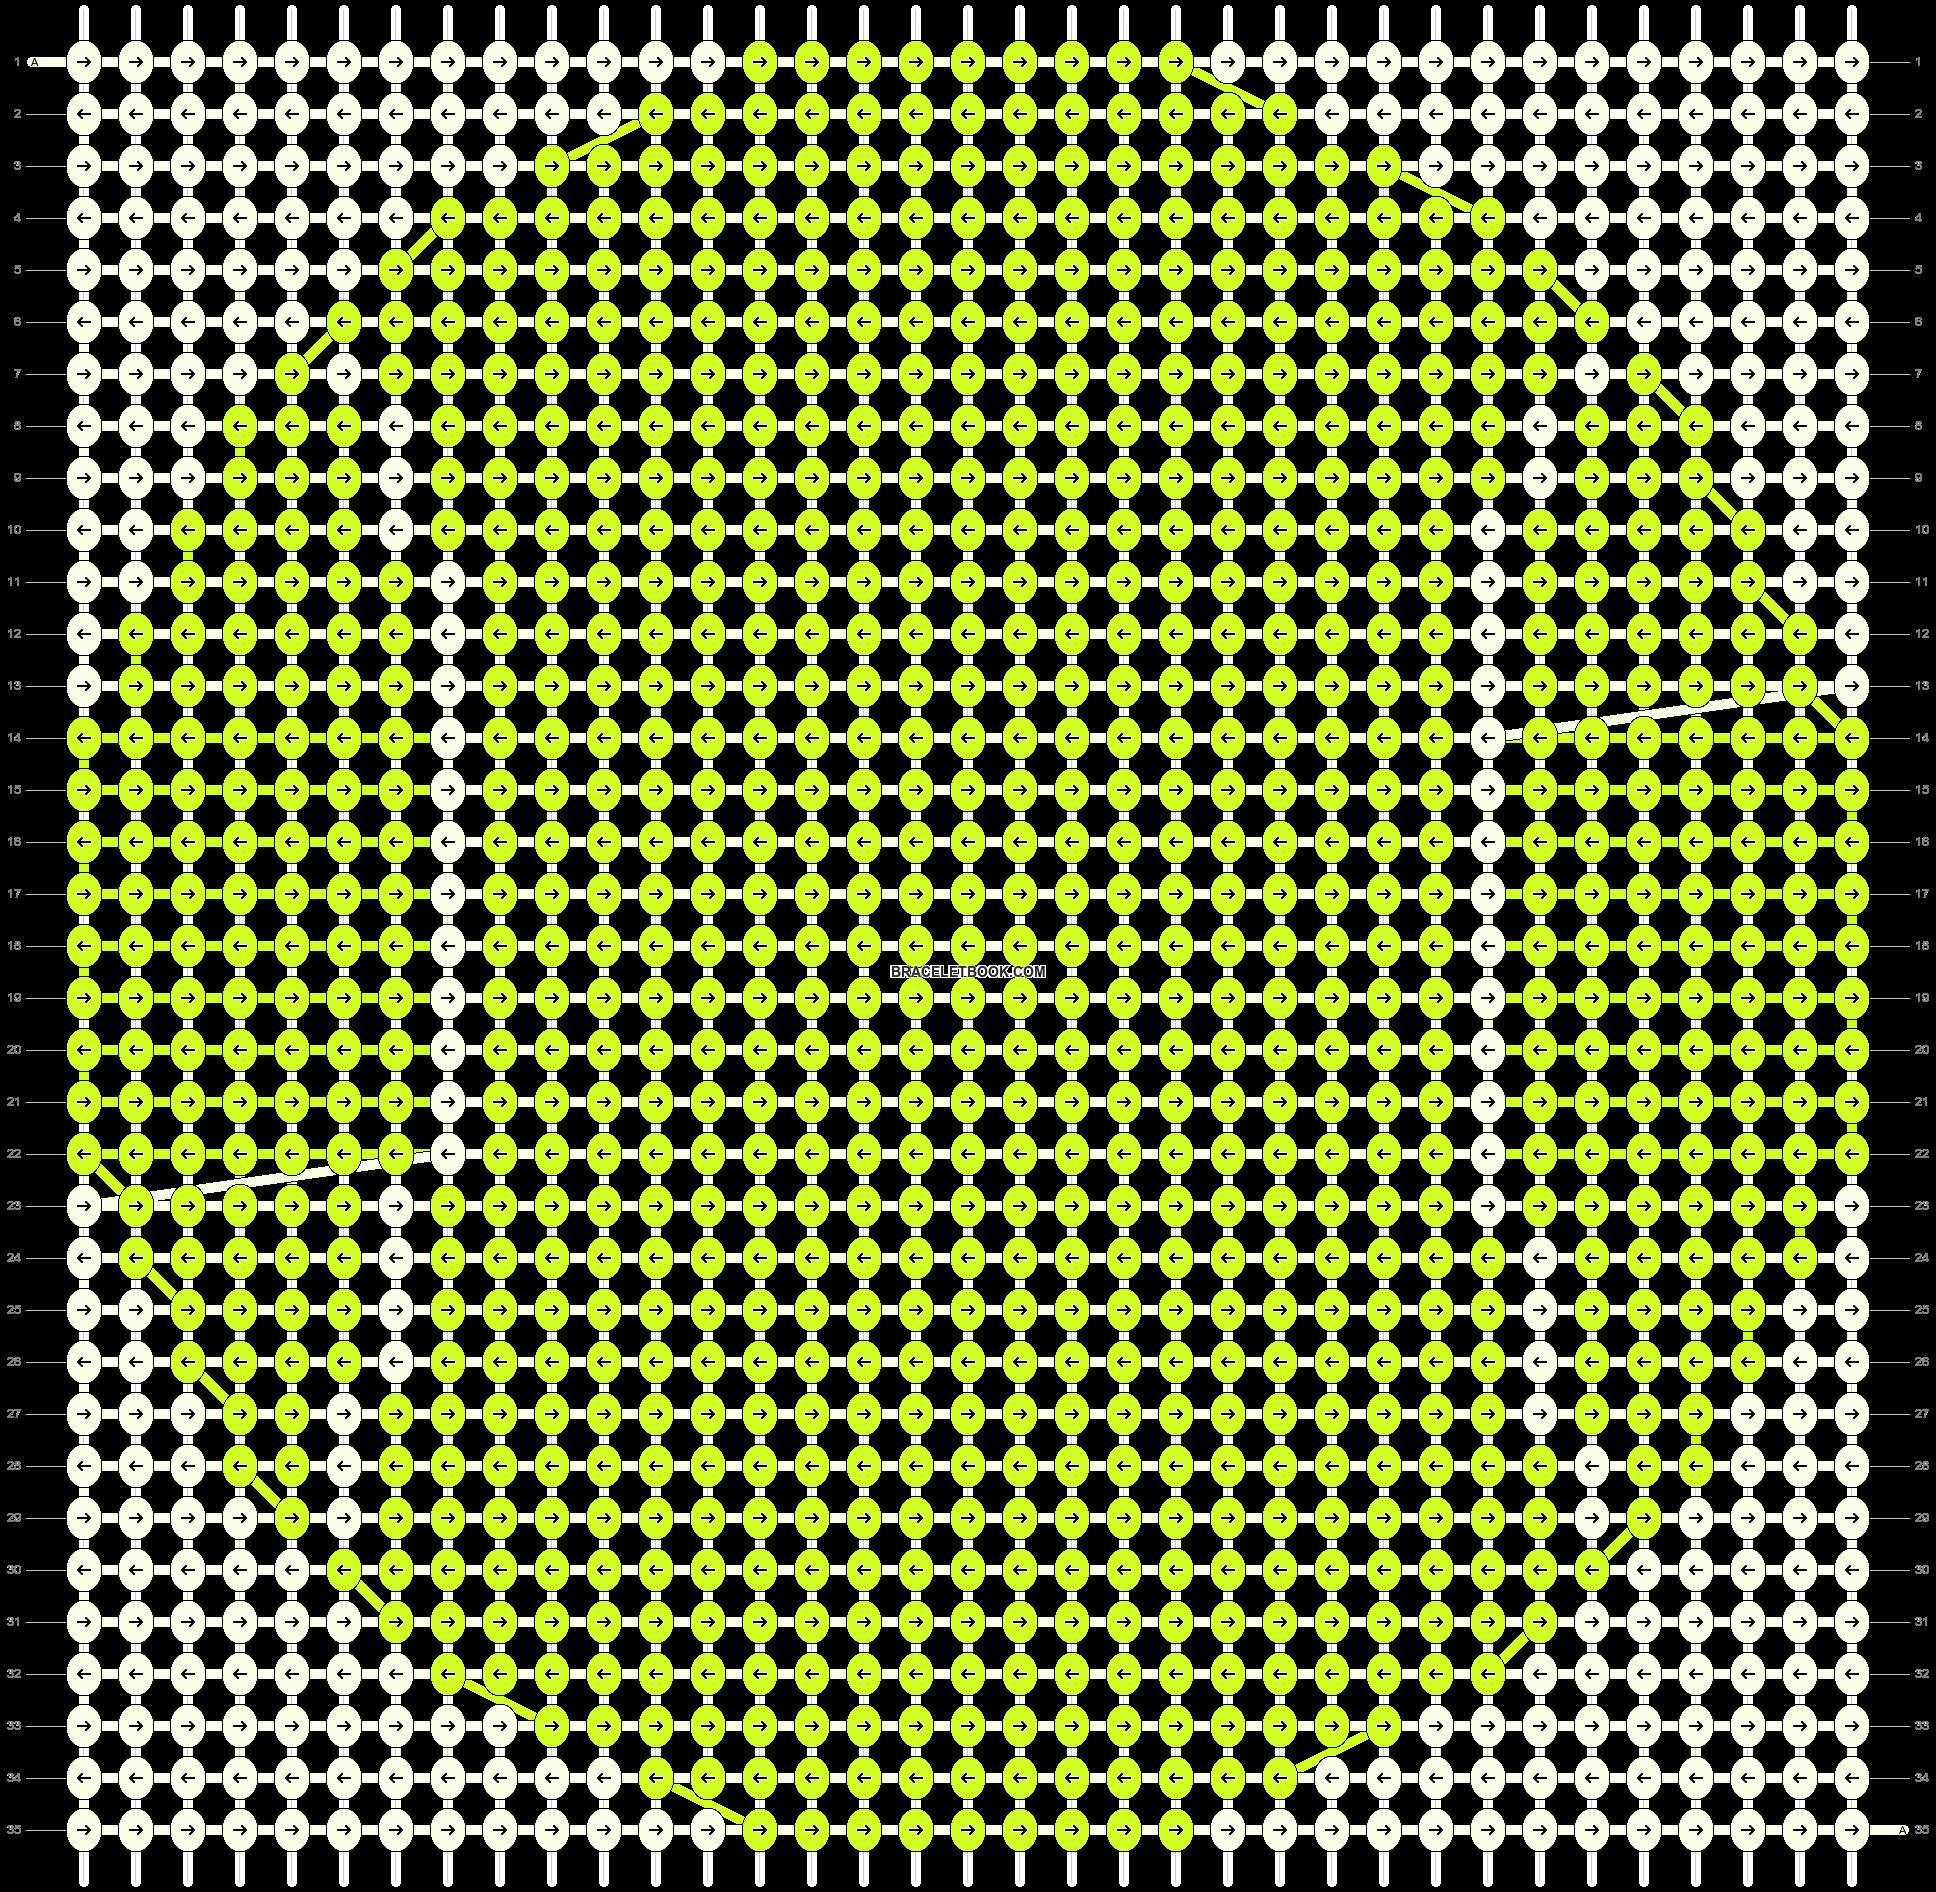 Alpha pattern #19631 pattern